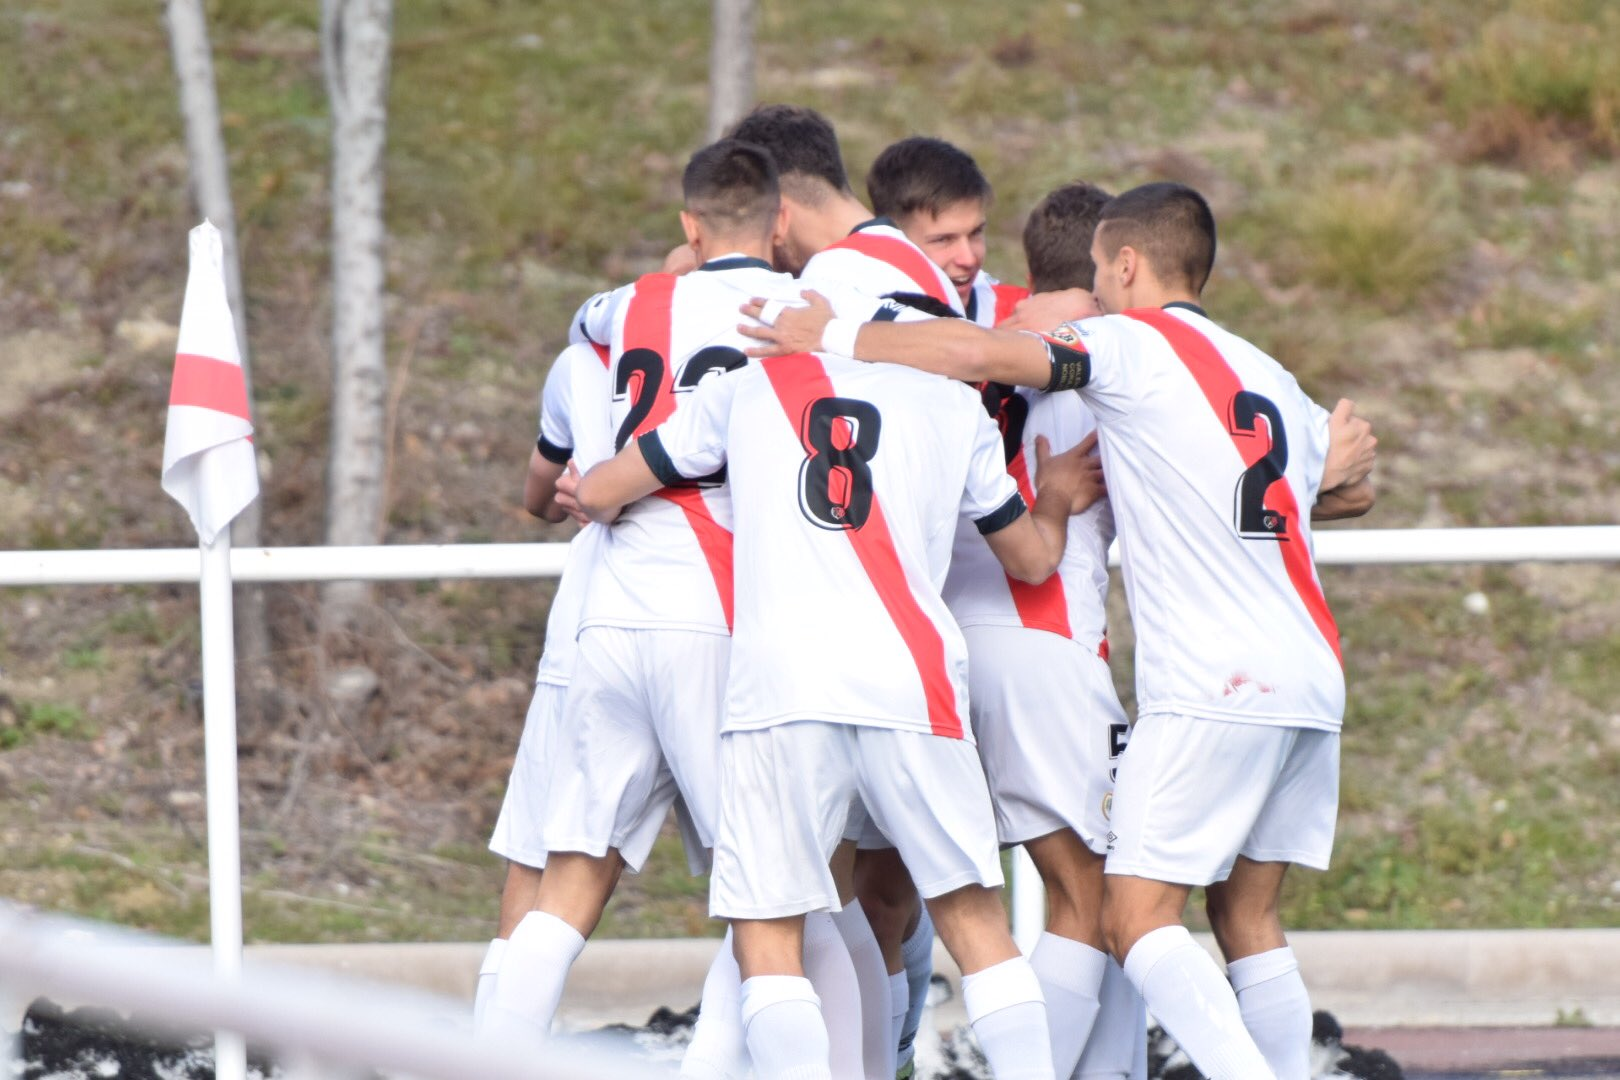 VÍDEO - Goles Tercera División / Subgrupo 7A - Jornada 13 (24 enero 2021)